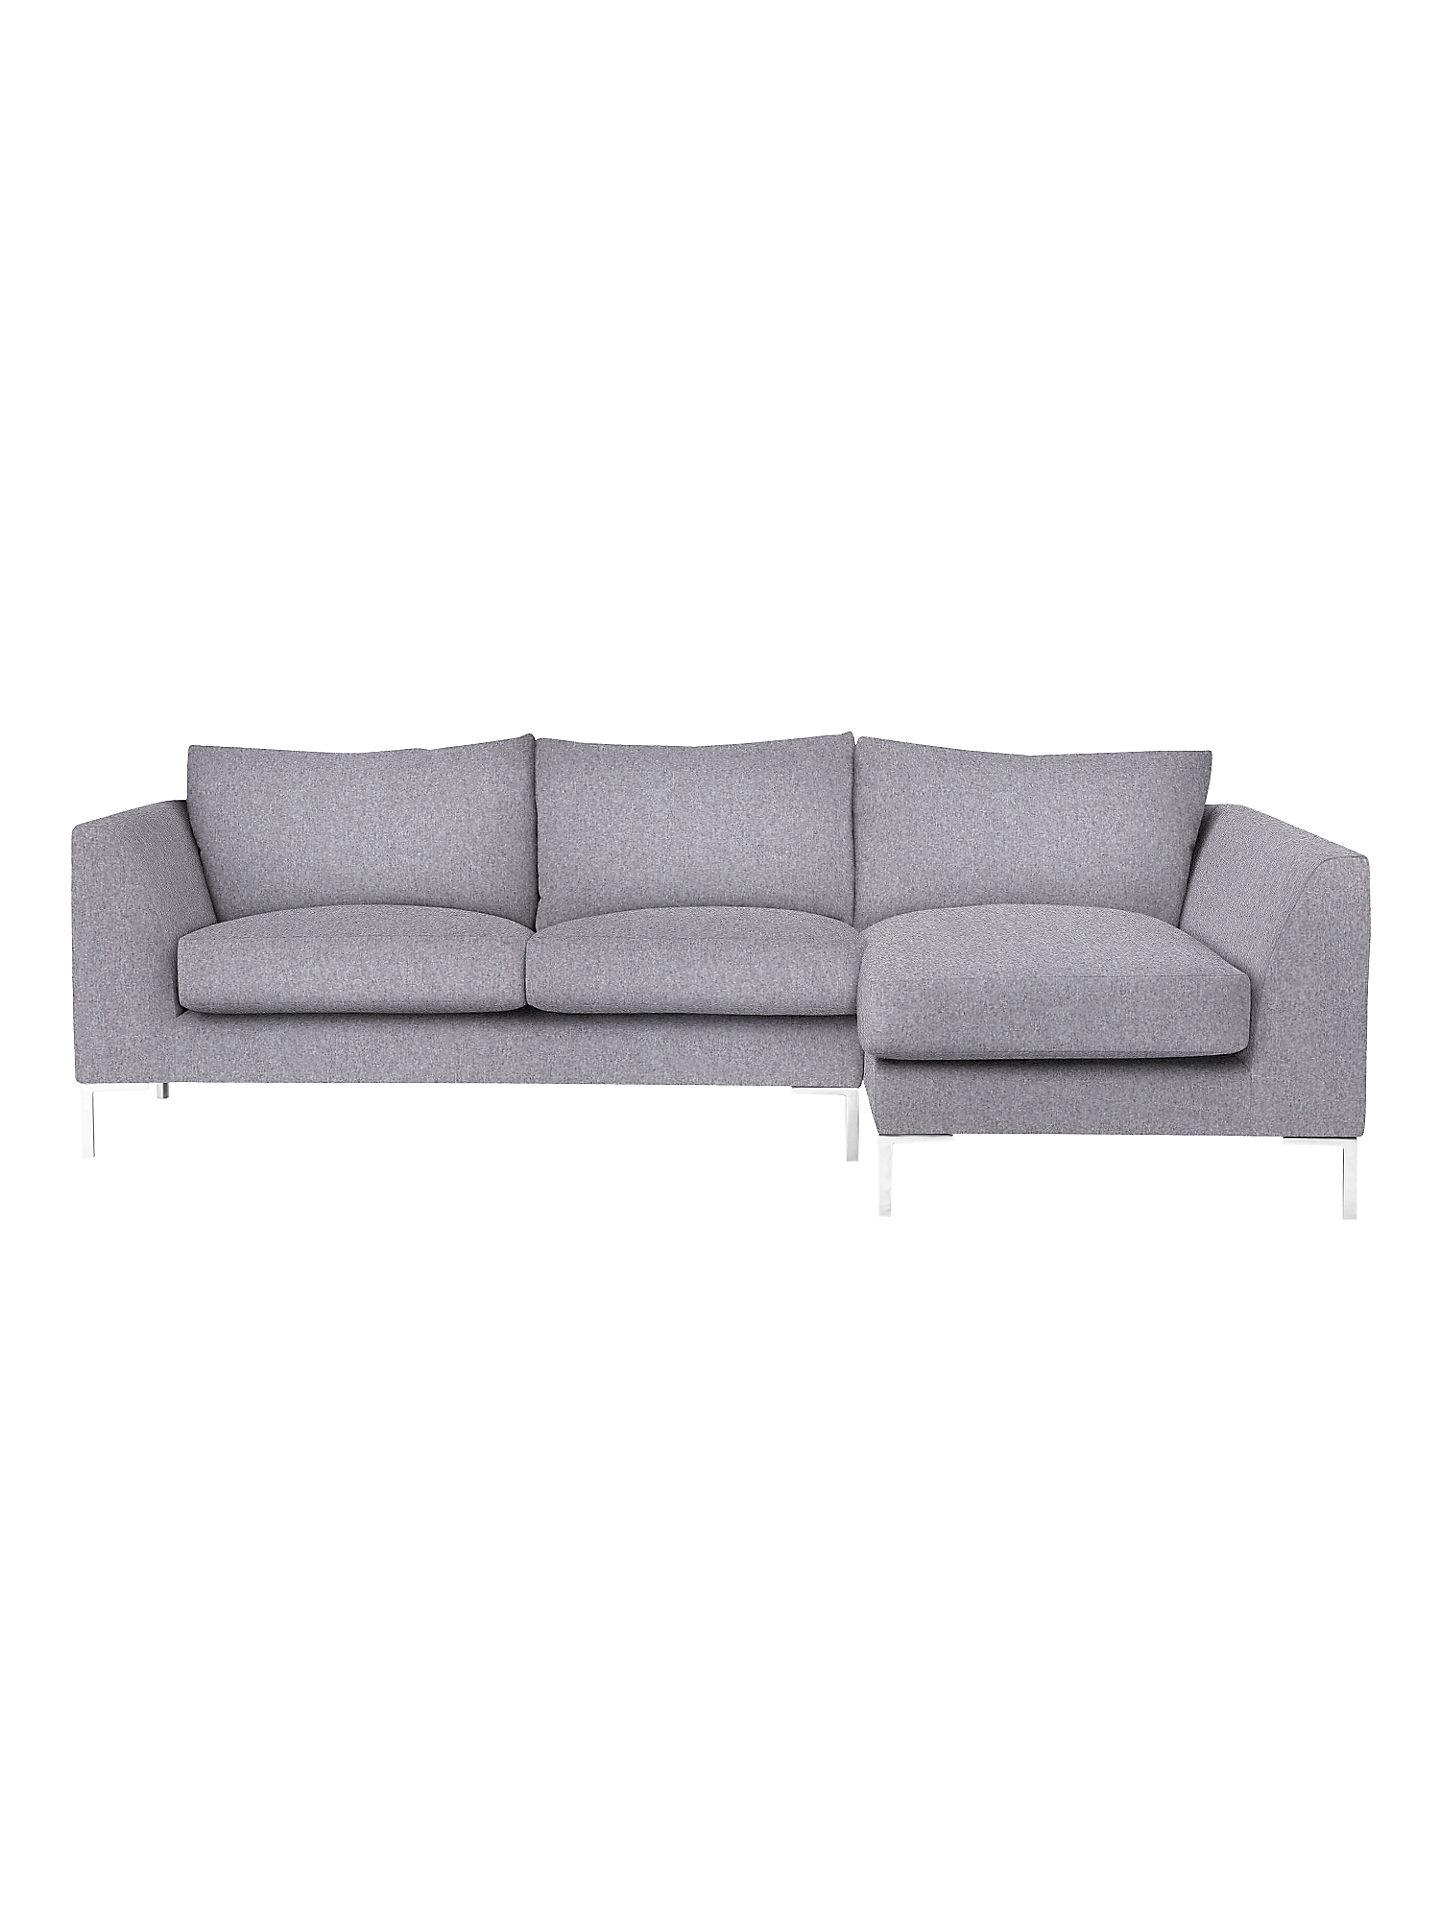 Buy John Lewis & Partners Belgrave RHF Chaise End Sofa, Metal Leg Online at johnlewis.com